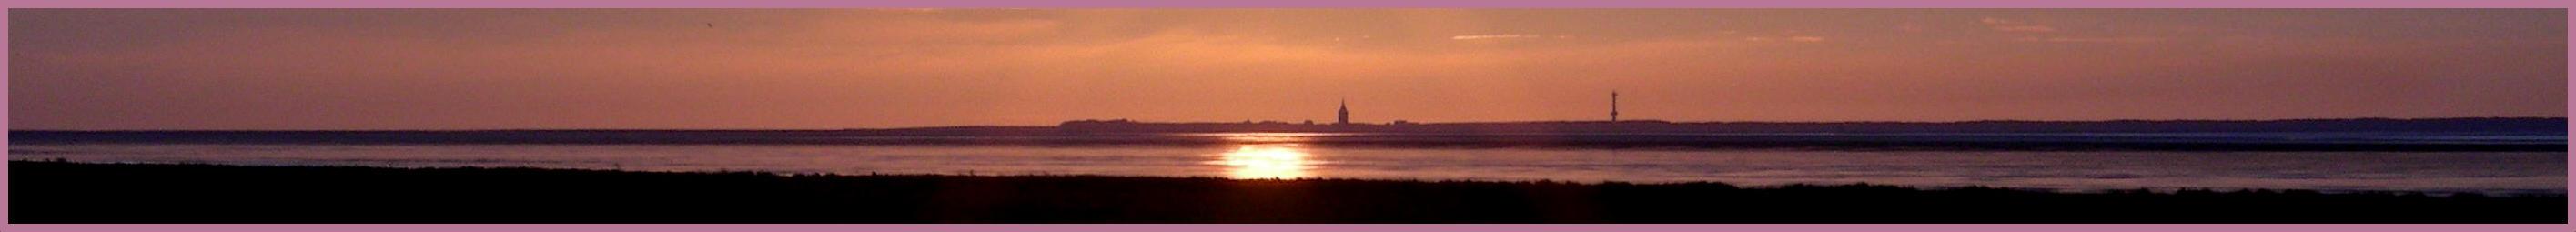 Abend über Wangerooge -2-